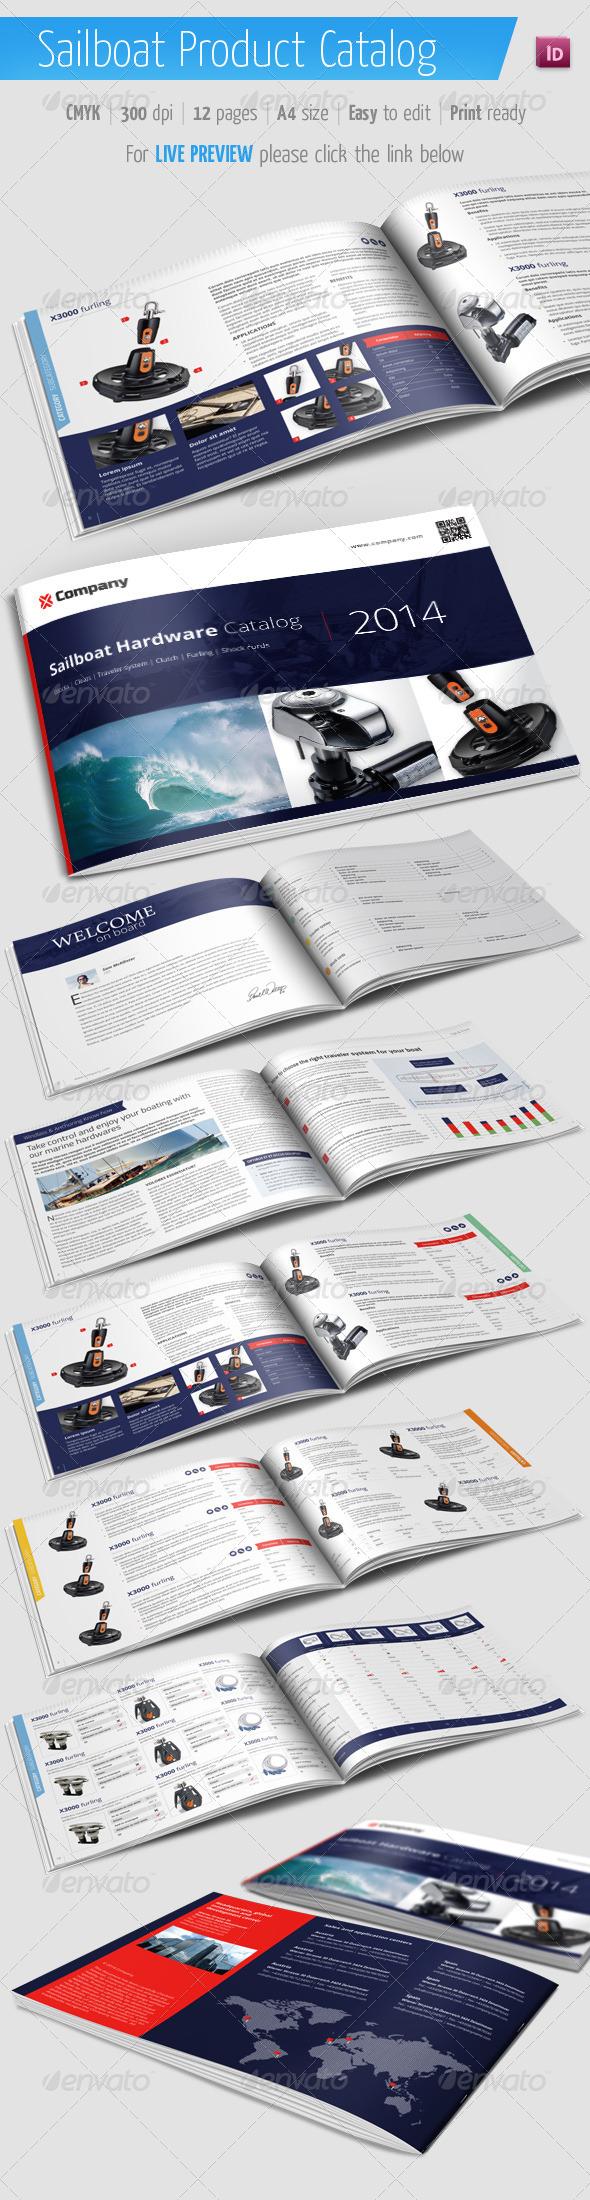 Sailboat Product Catalog - Marine Brochure - Catalogs Brochures